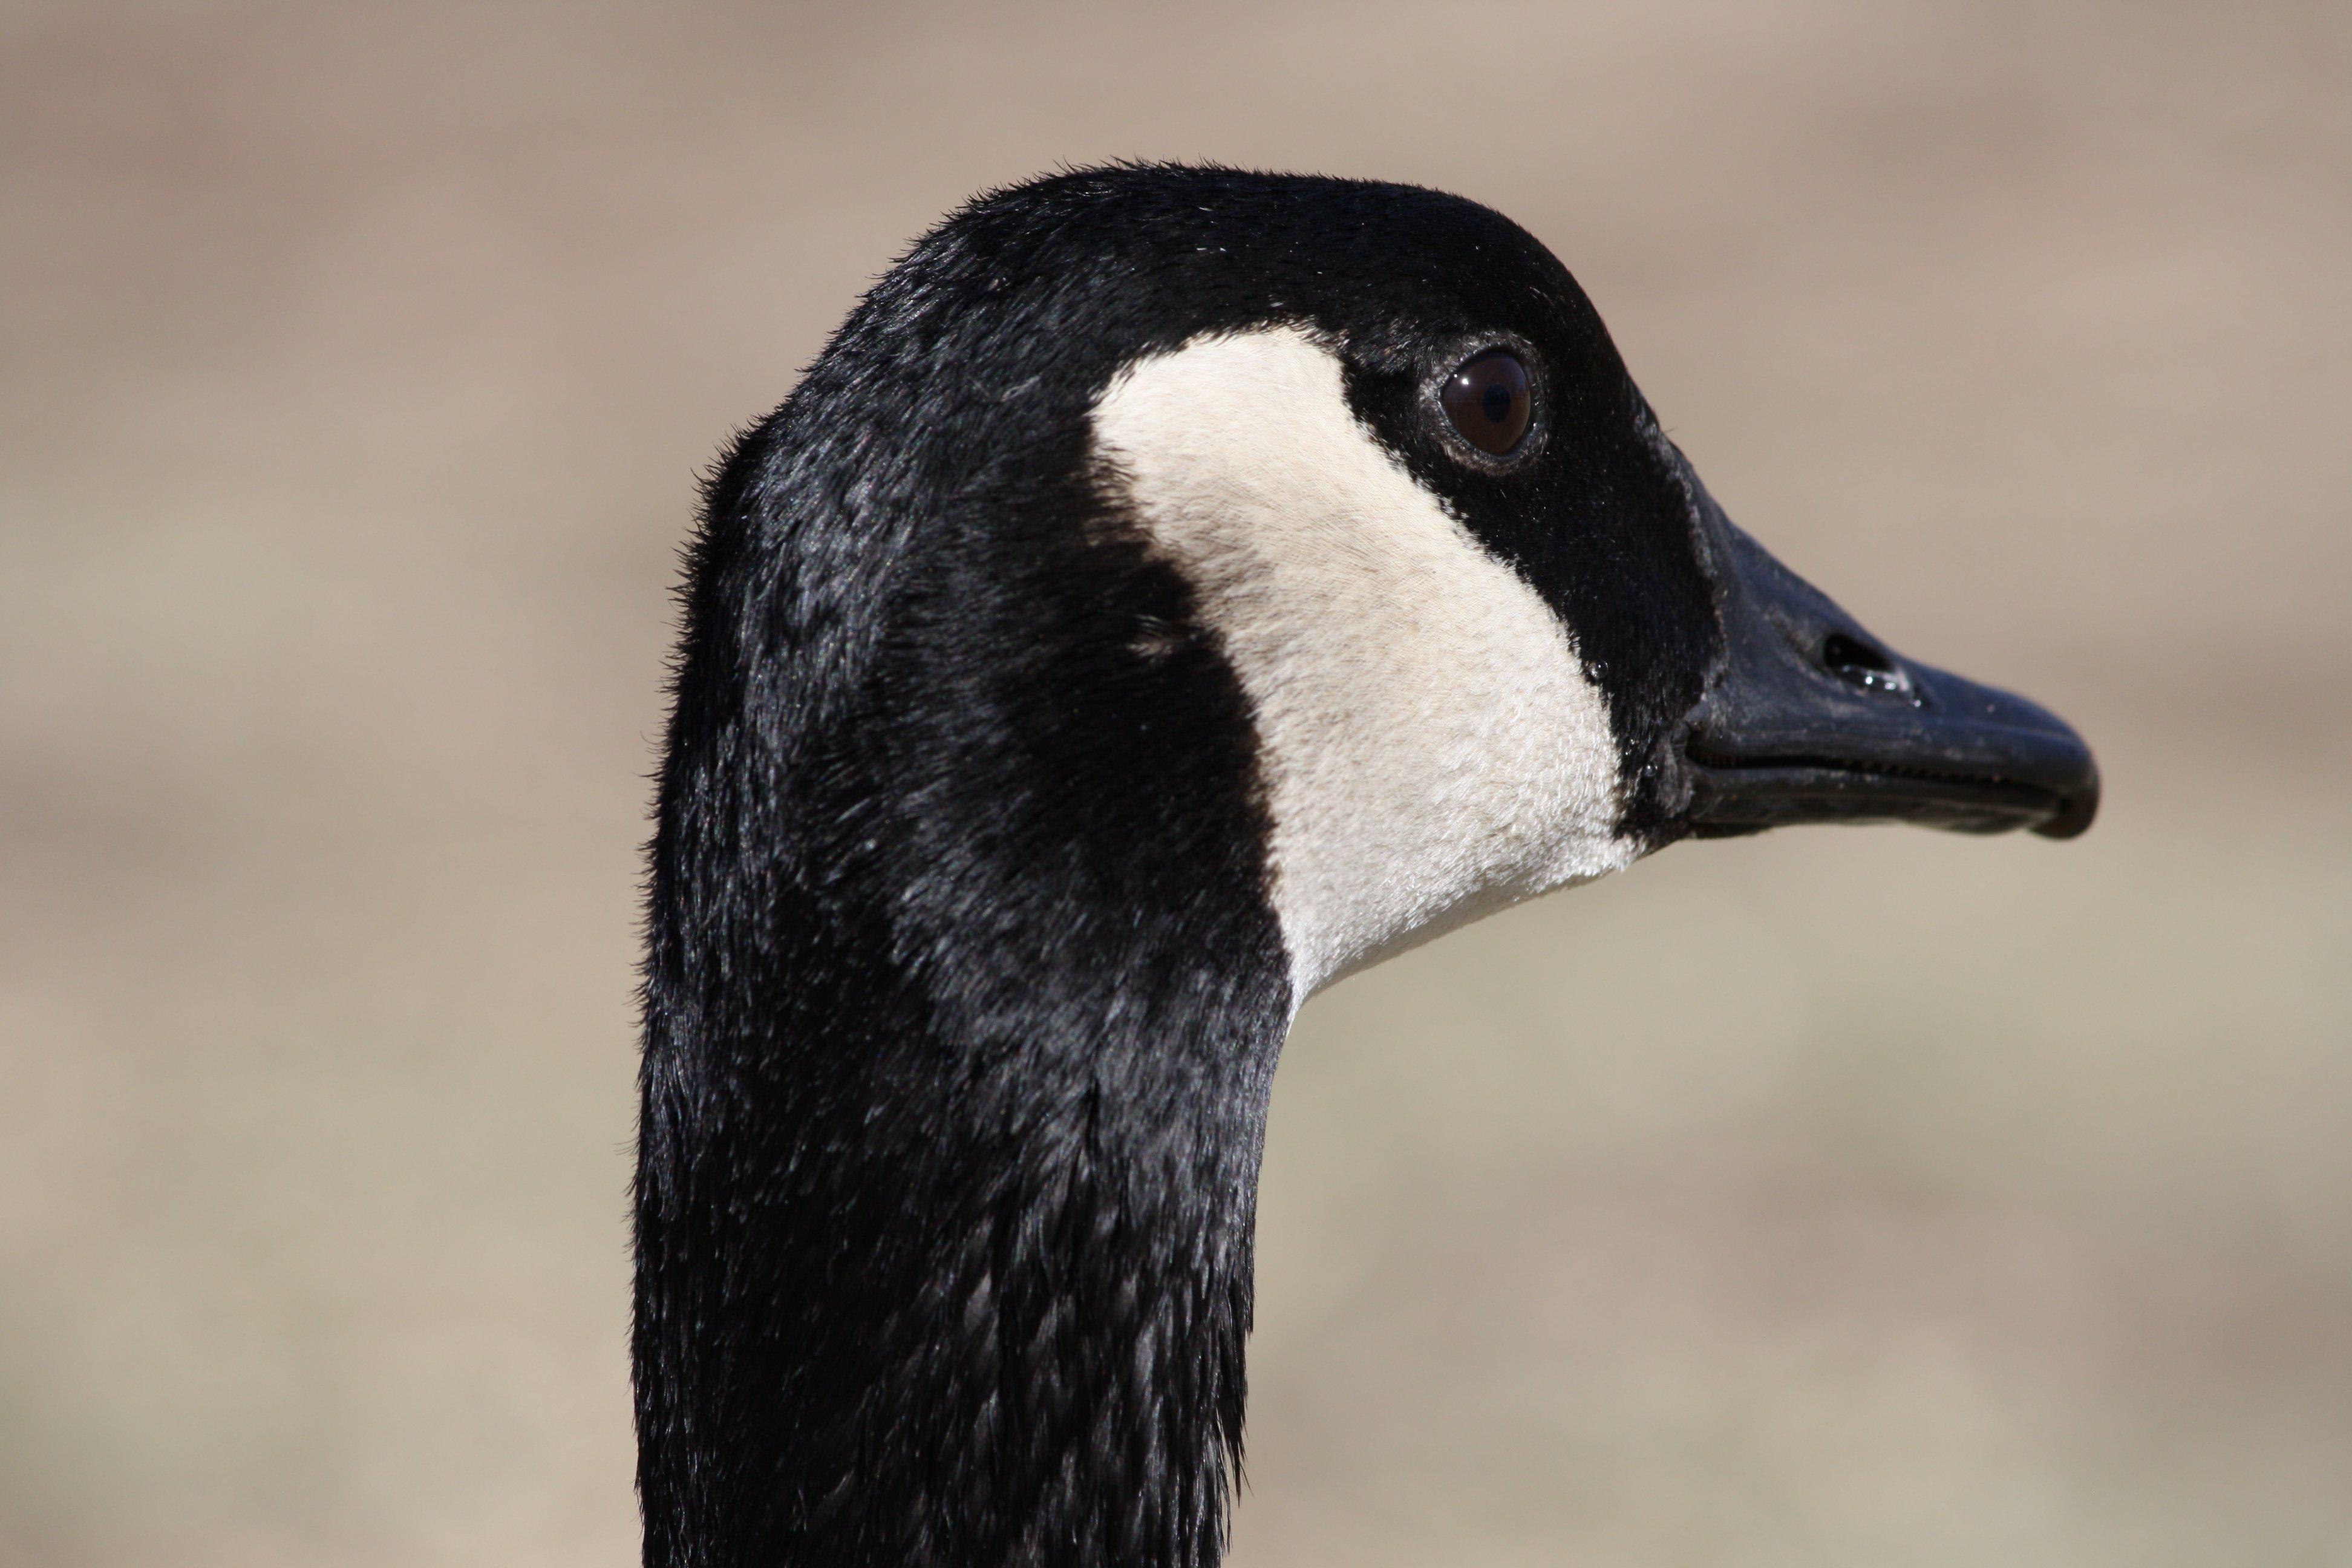 Goose Face Close Up Picture Free Photograph Photos